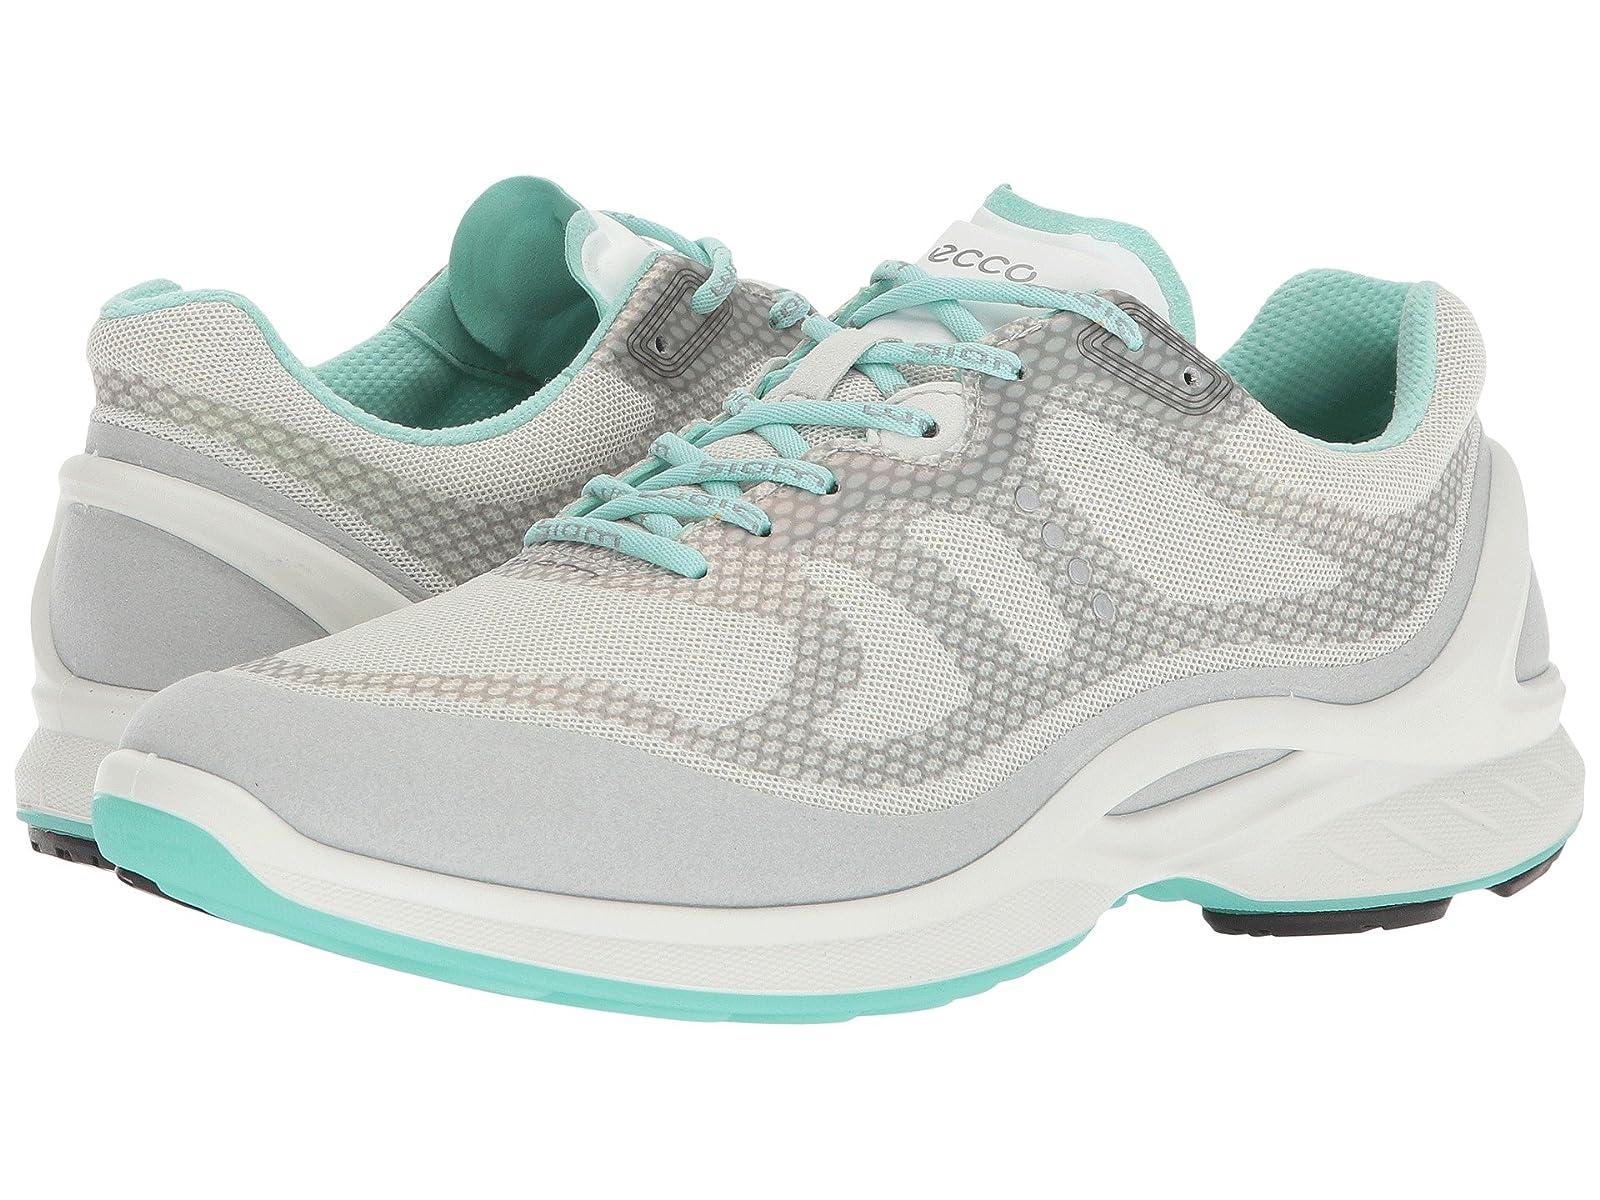 ECCO Biom Fjuel TieAtmospheric grades have affordable shoes